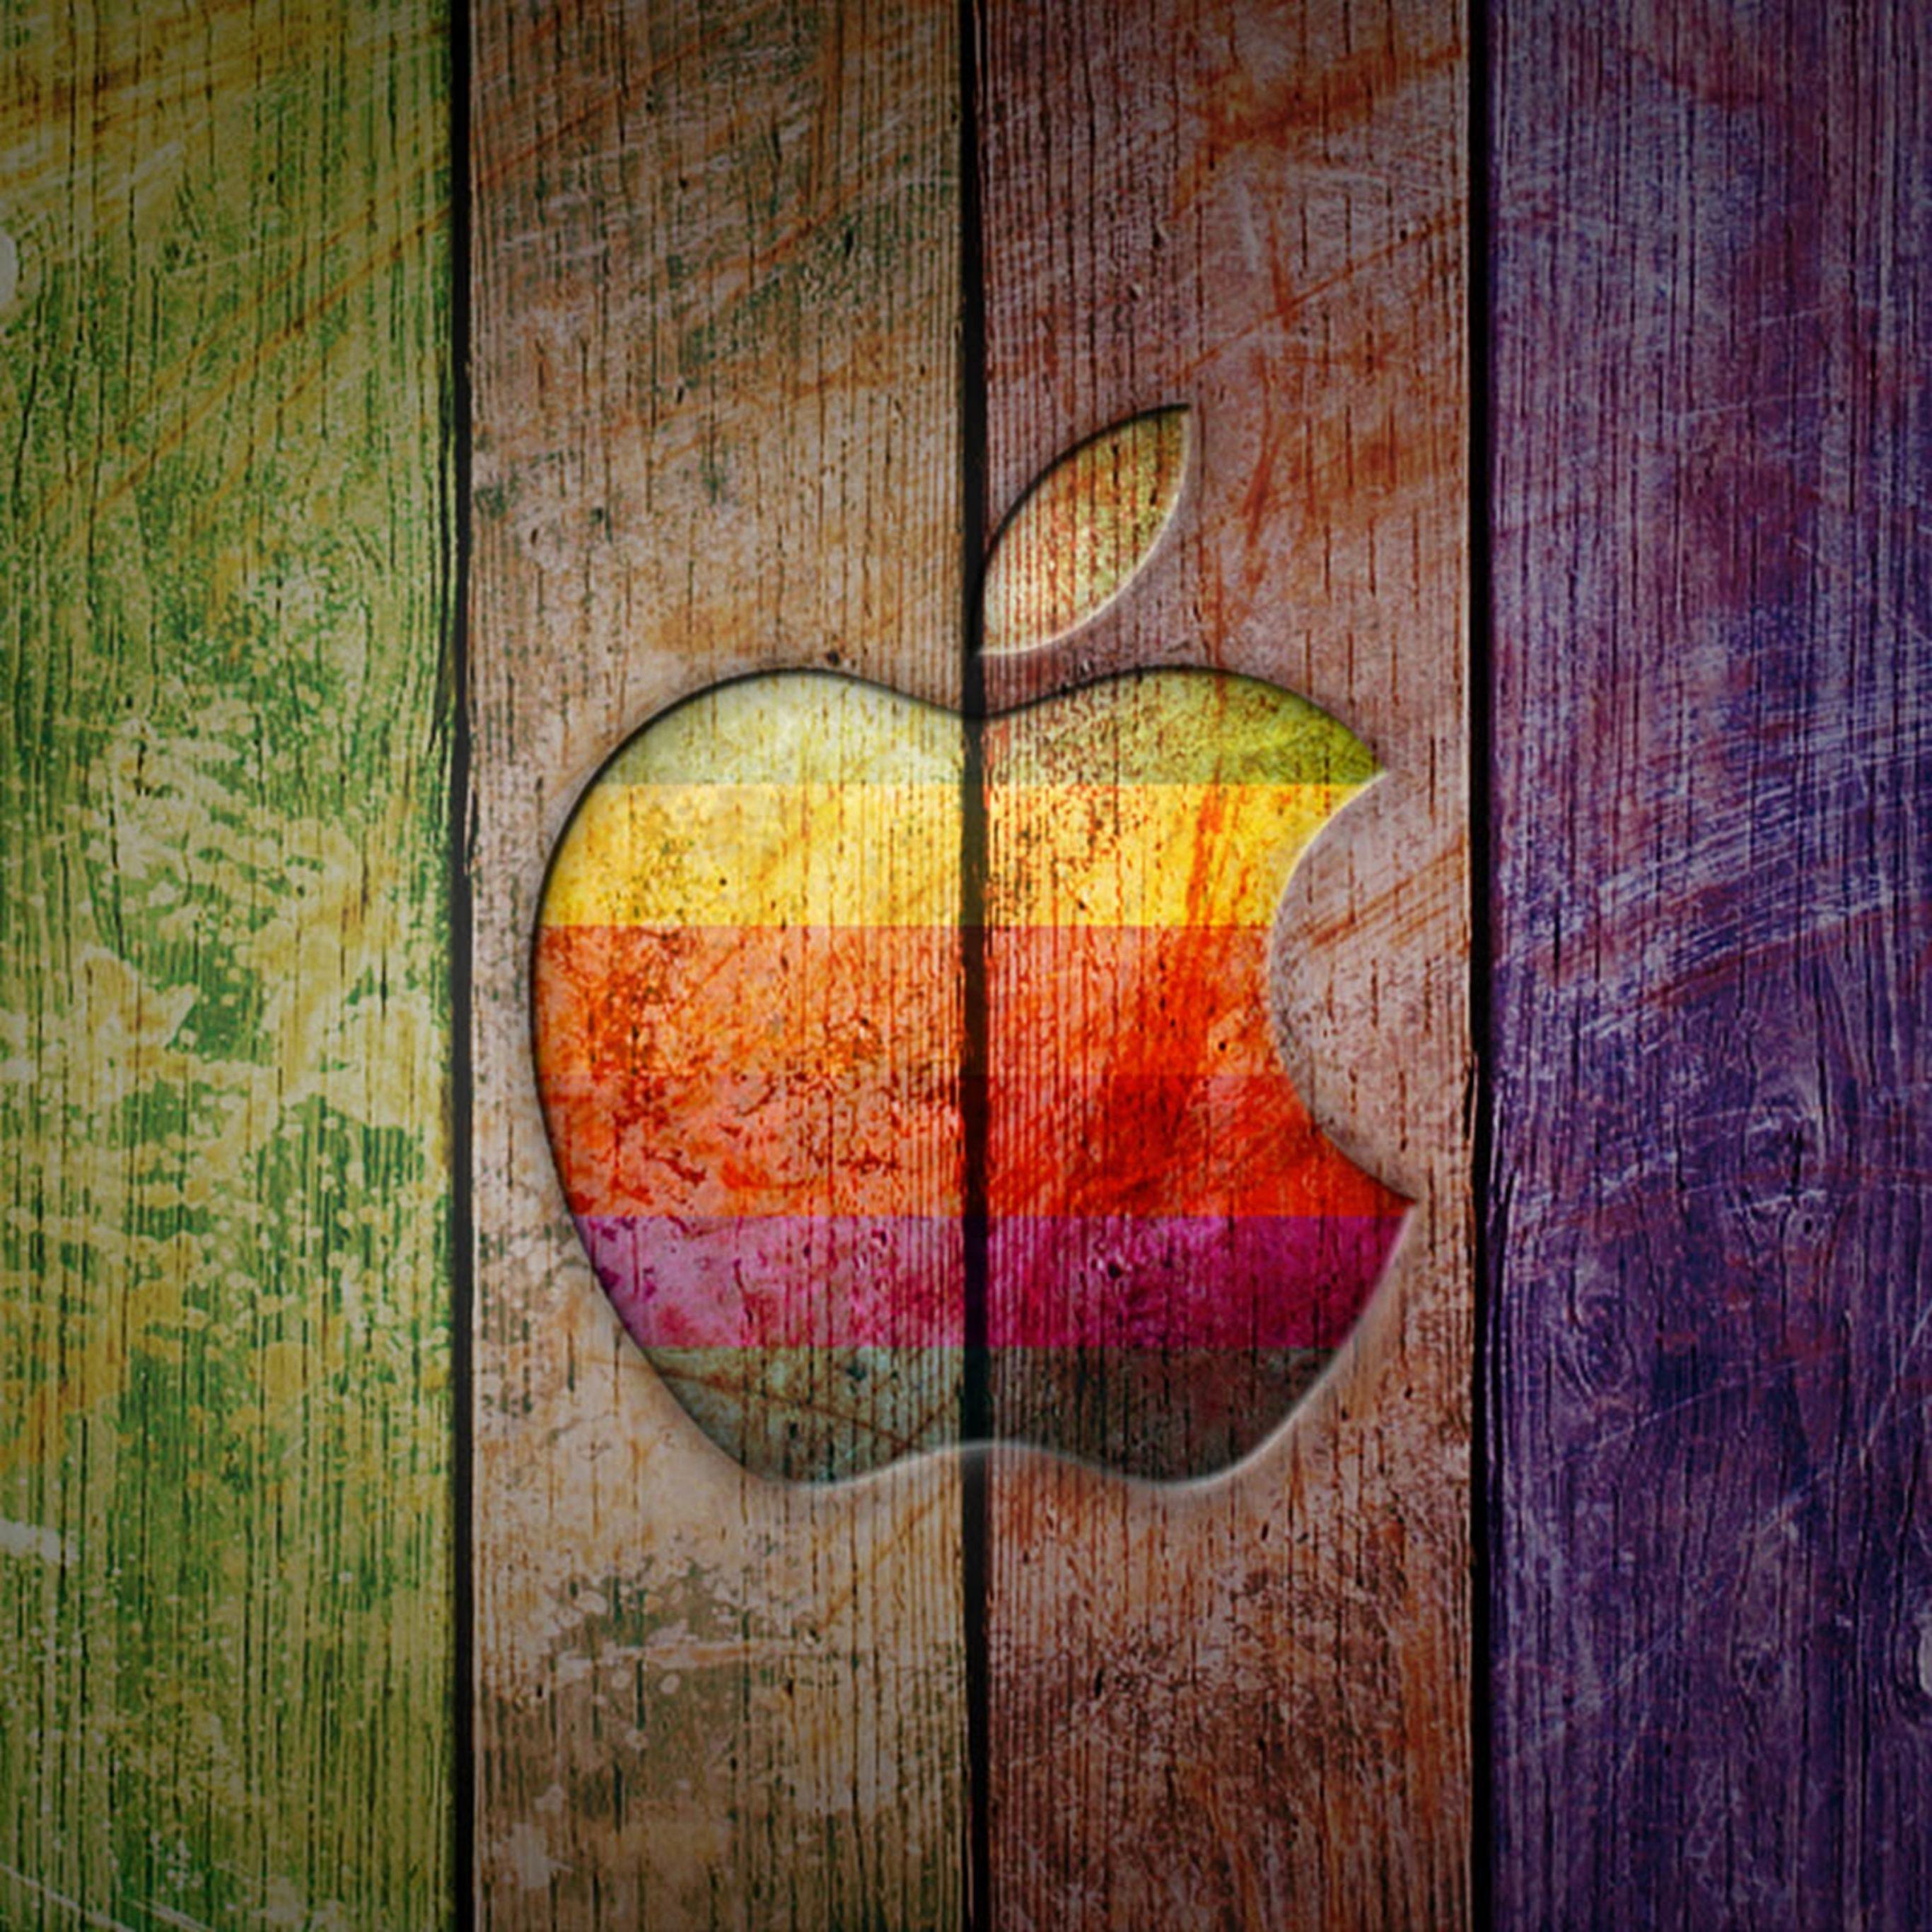 2732x2732 wallpapers 4k iPad Pro Apple Logo on Colorful Wood Ipad Wallpaper 2732x2732 pixels resolution